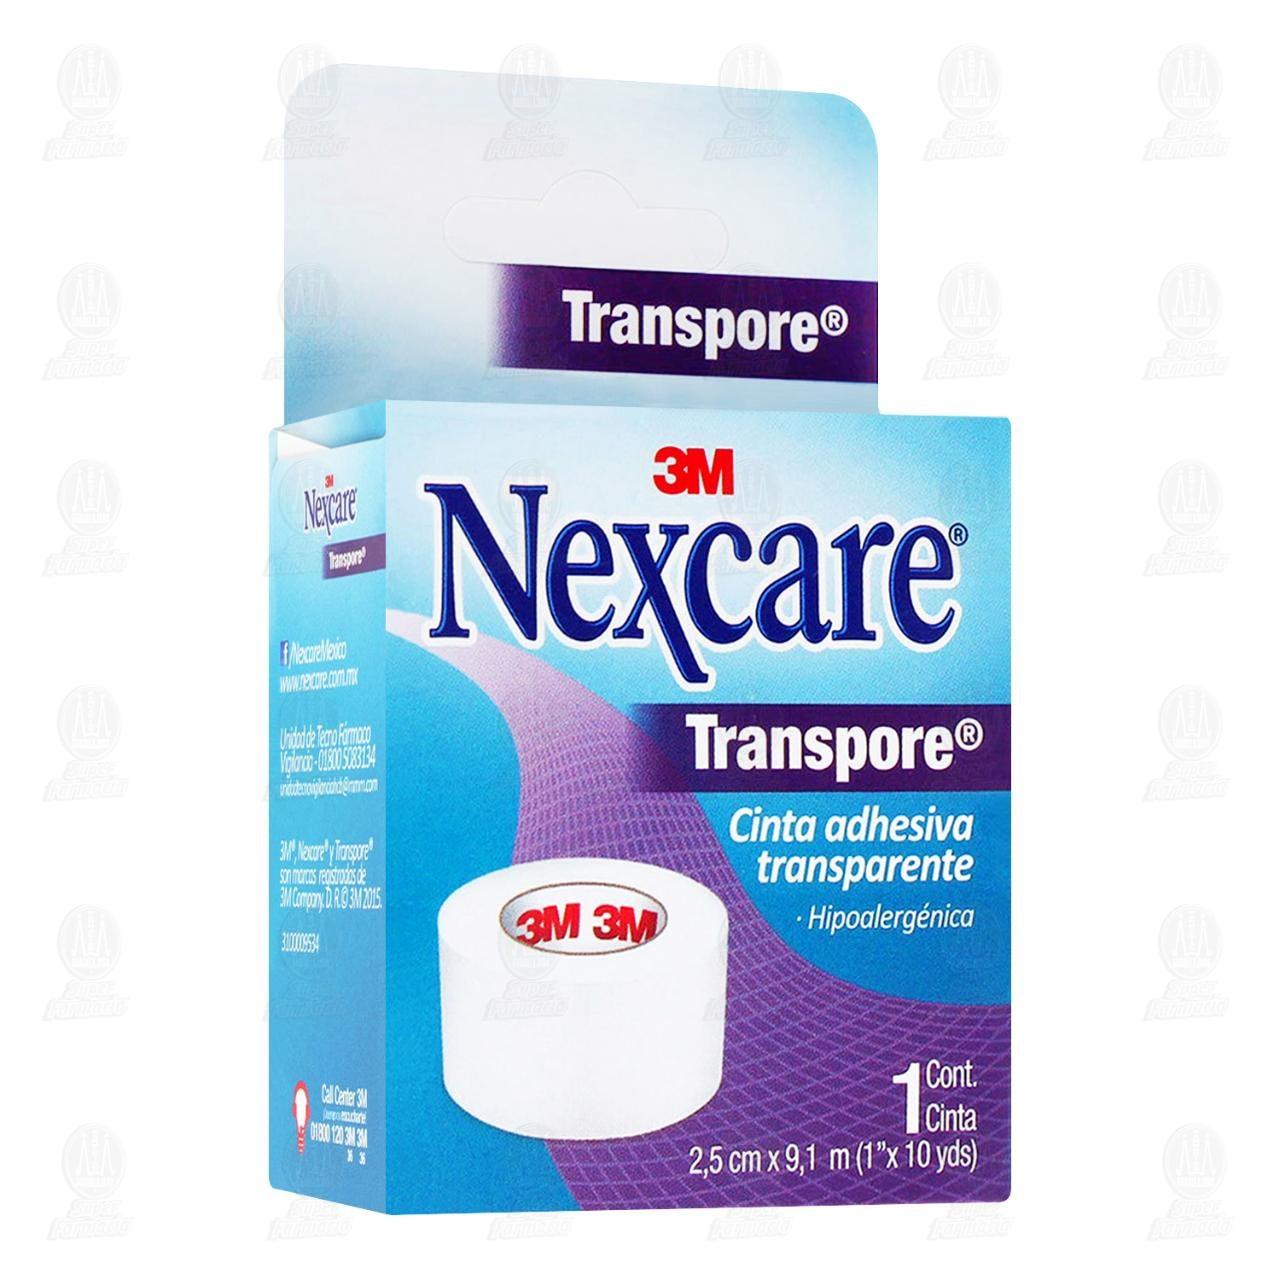 Comprar 3M Nexcare Cinta Adhesiva Transpore Transparente 2.5cm x 9.1m 1pz en Farmacias Guadalajara